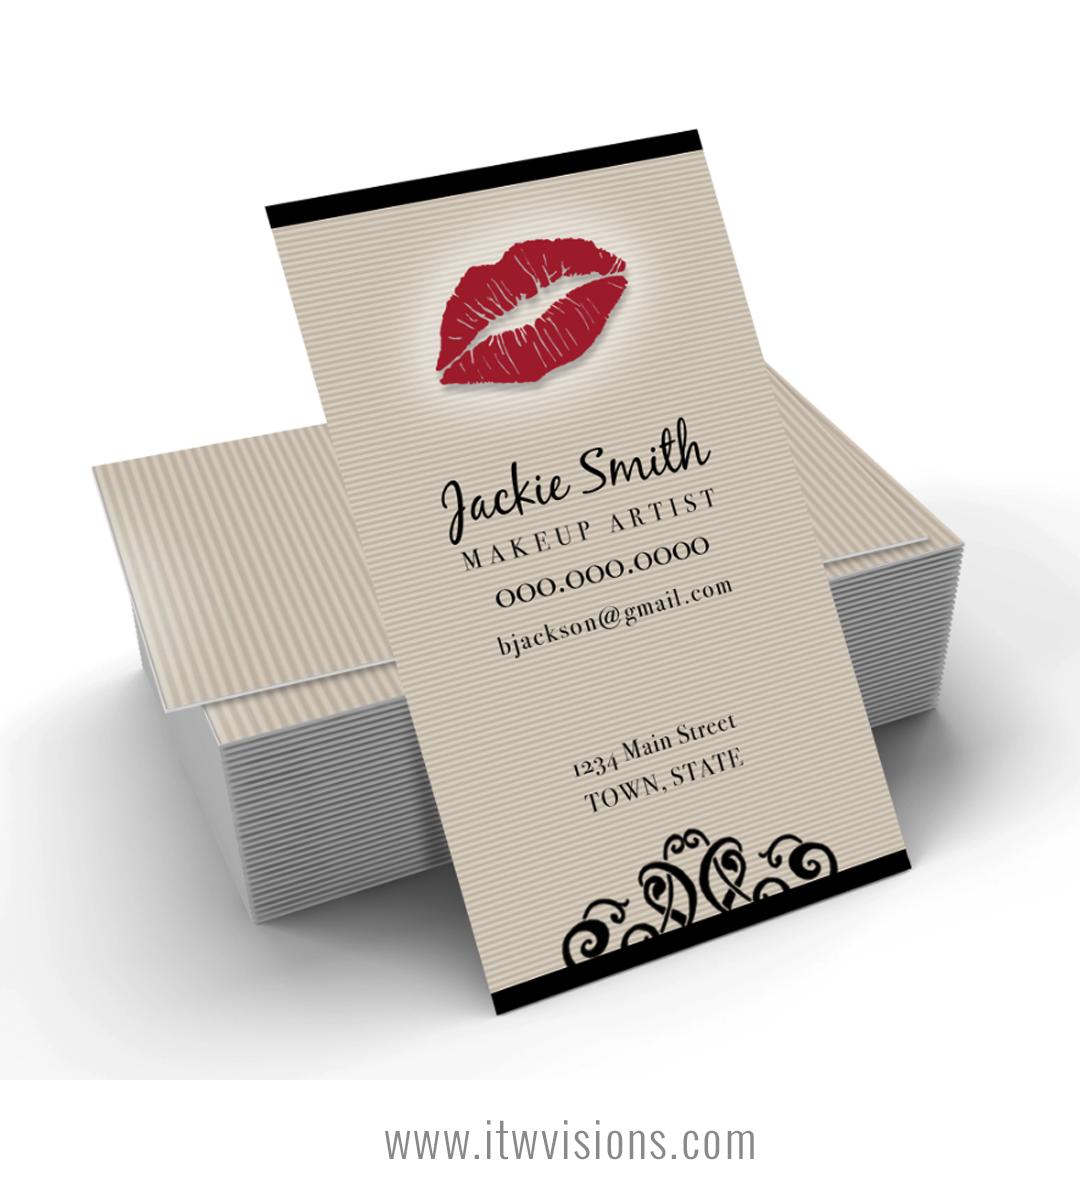 Makeup Artist Business Card Tan Pinstripes With Red Lips Itw Visions Makeup Artist Business Cards Makeup Business Cards Printing Business Cards